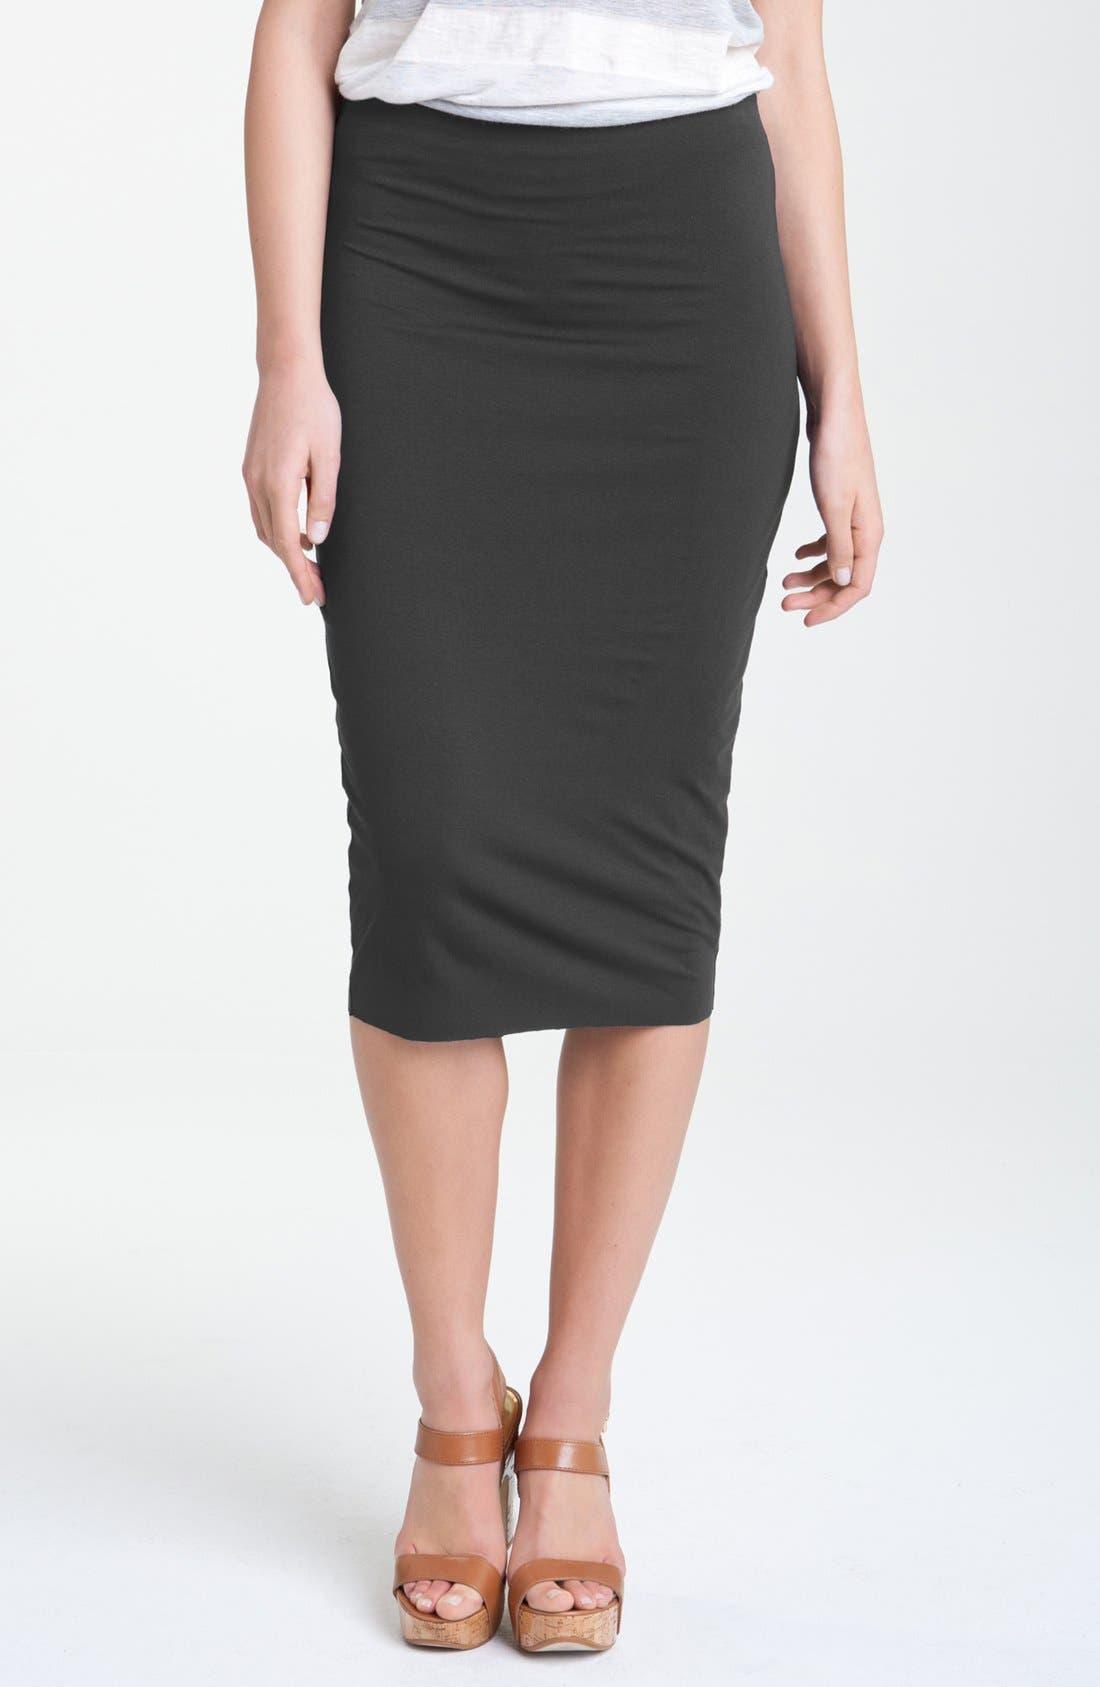 Alternate Image 1 Selected - Vince Camuto Midi Tube Skirt (Petite)